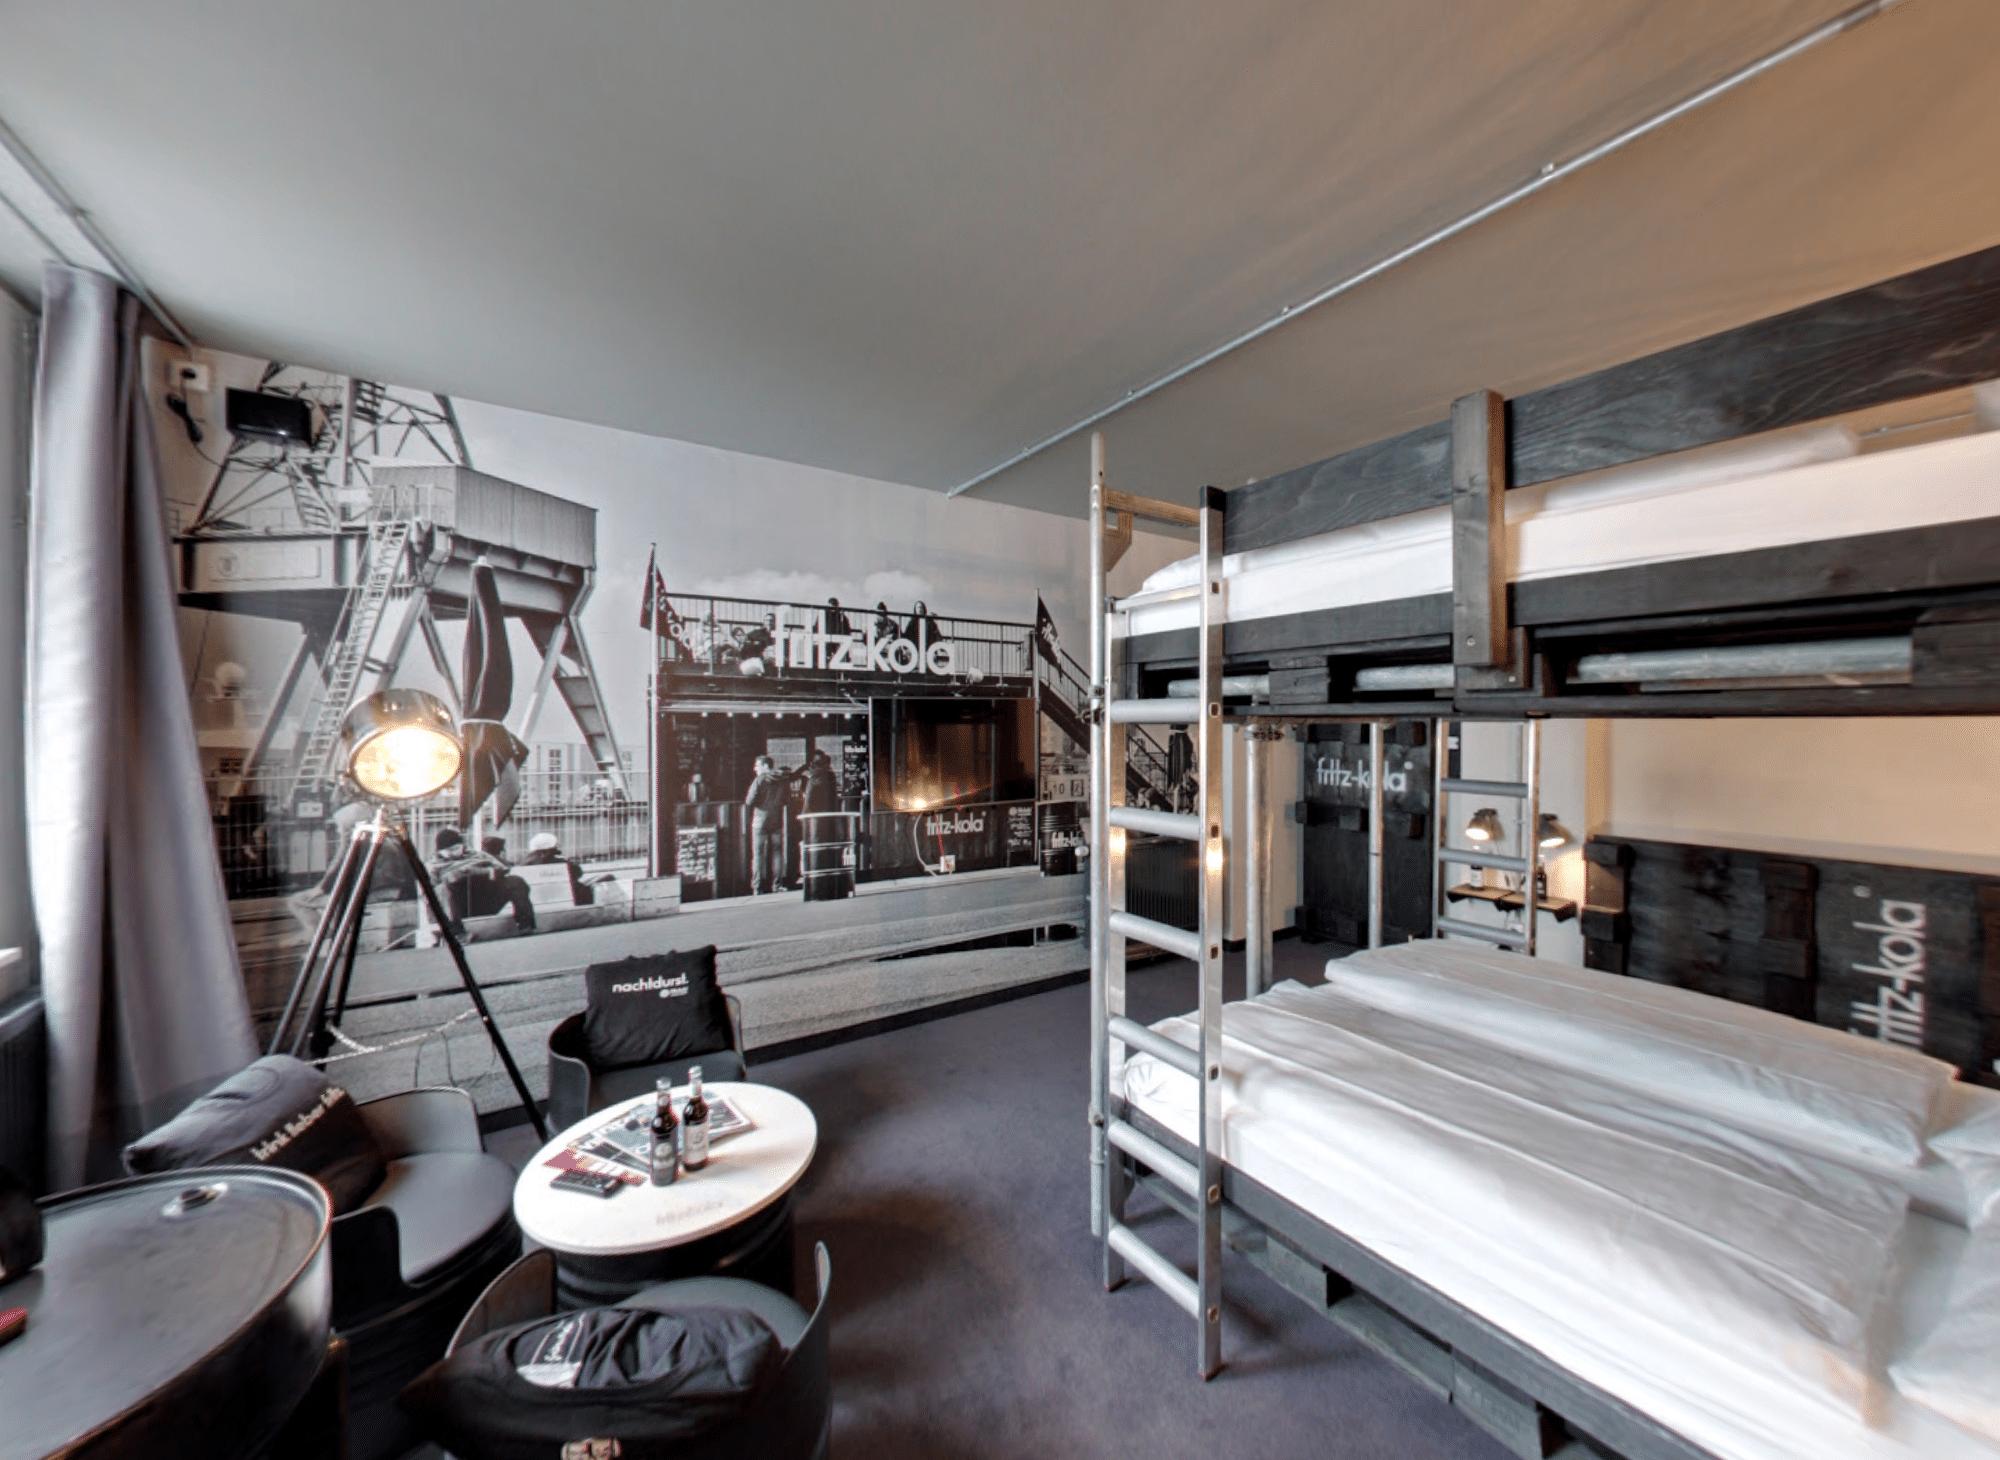 superbude hotel hostel st georg 2 patrick roddelkopf fotografie